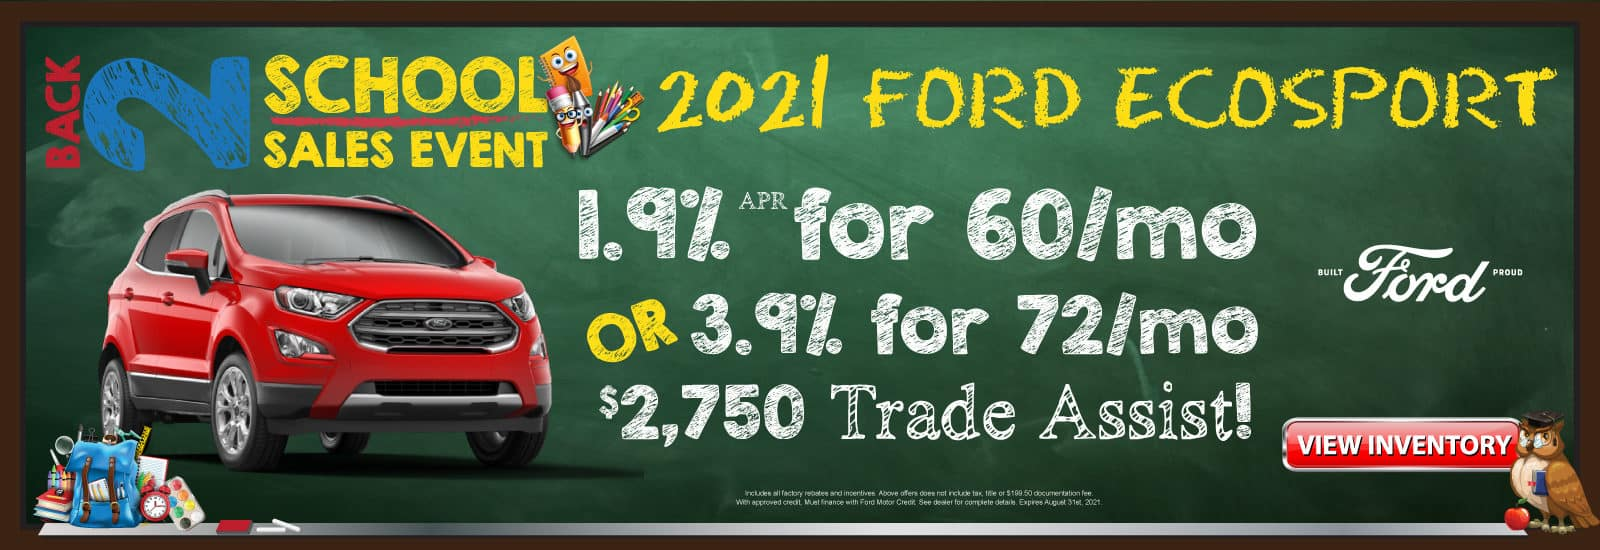 2021-Ford-Ecosport-Web-Banner-1600×550 (2)